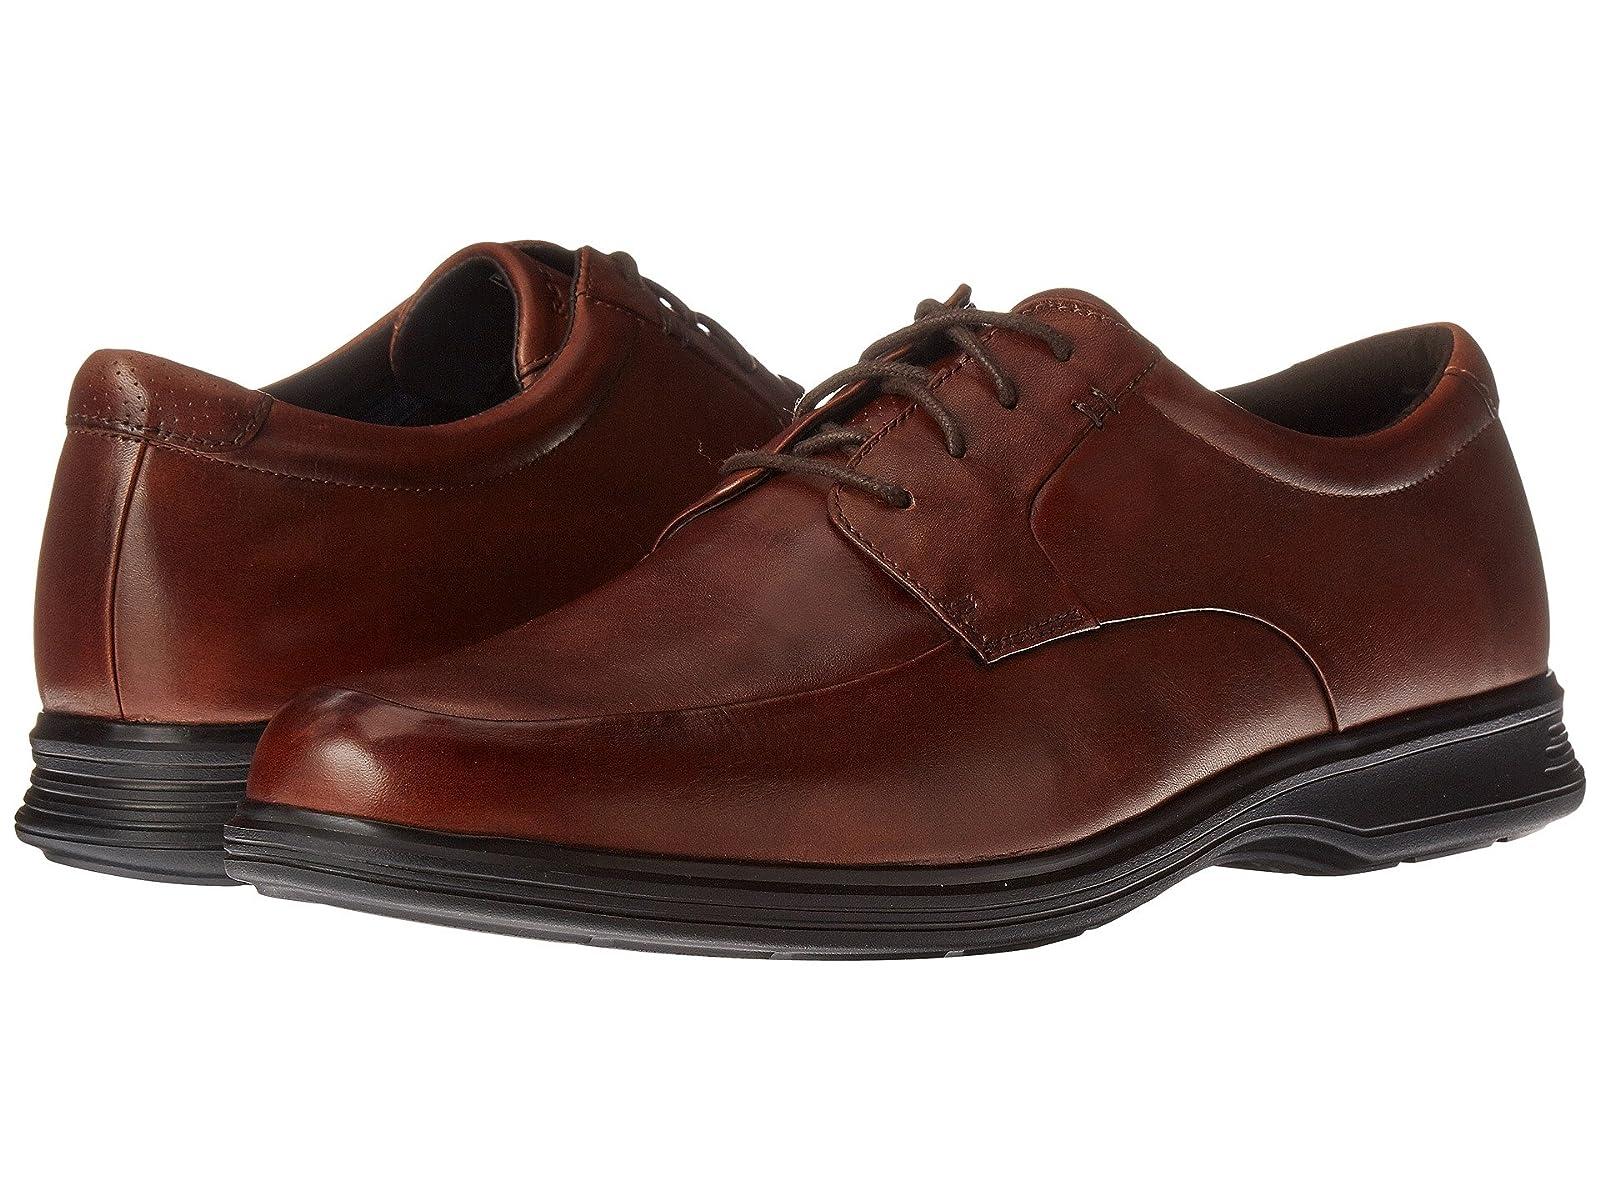 Rockport Dressports 2+ Light Apron ToeCheap and distinctive eye-catching shoes